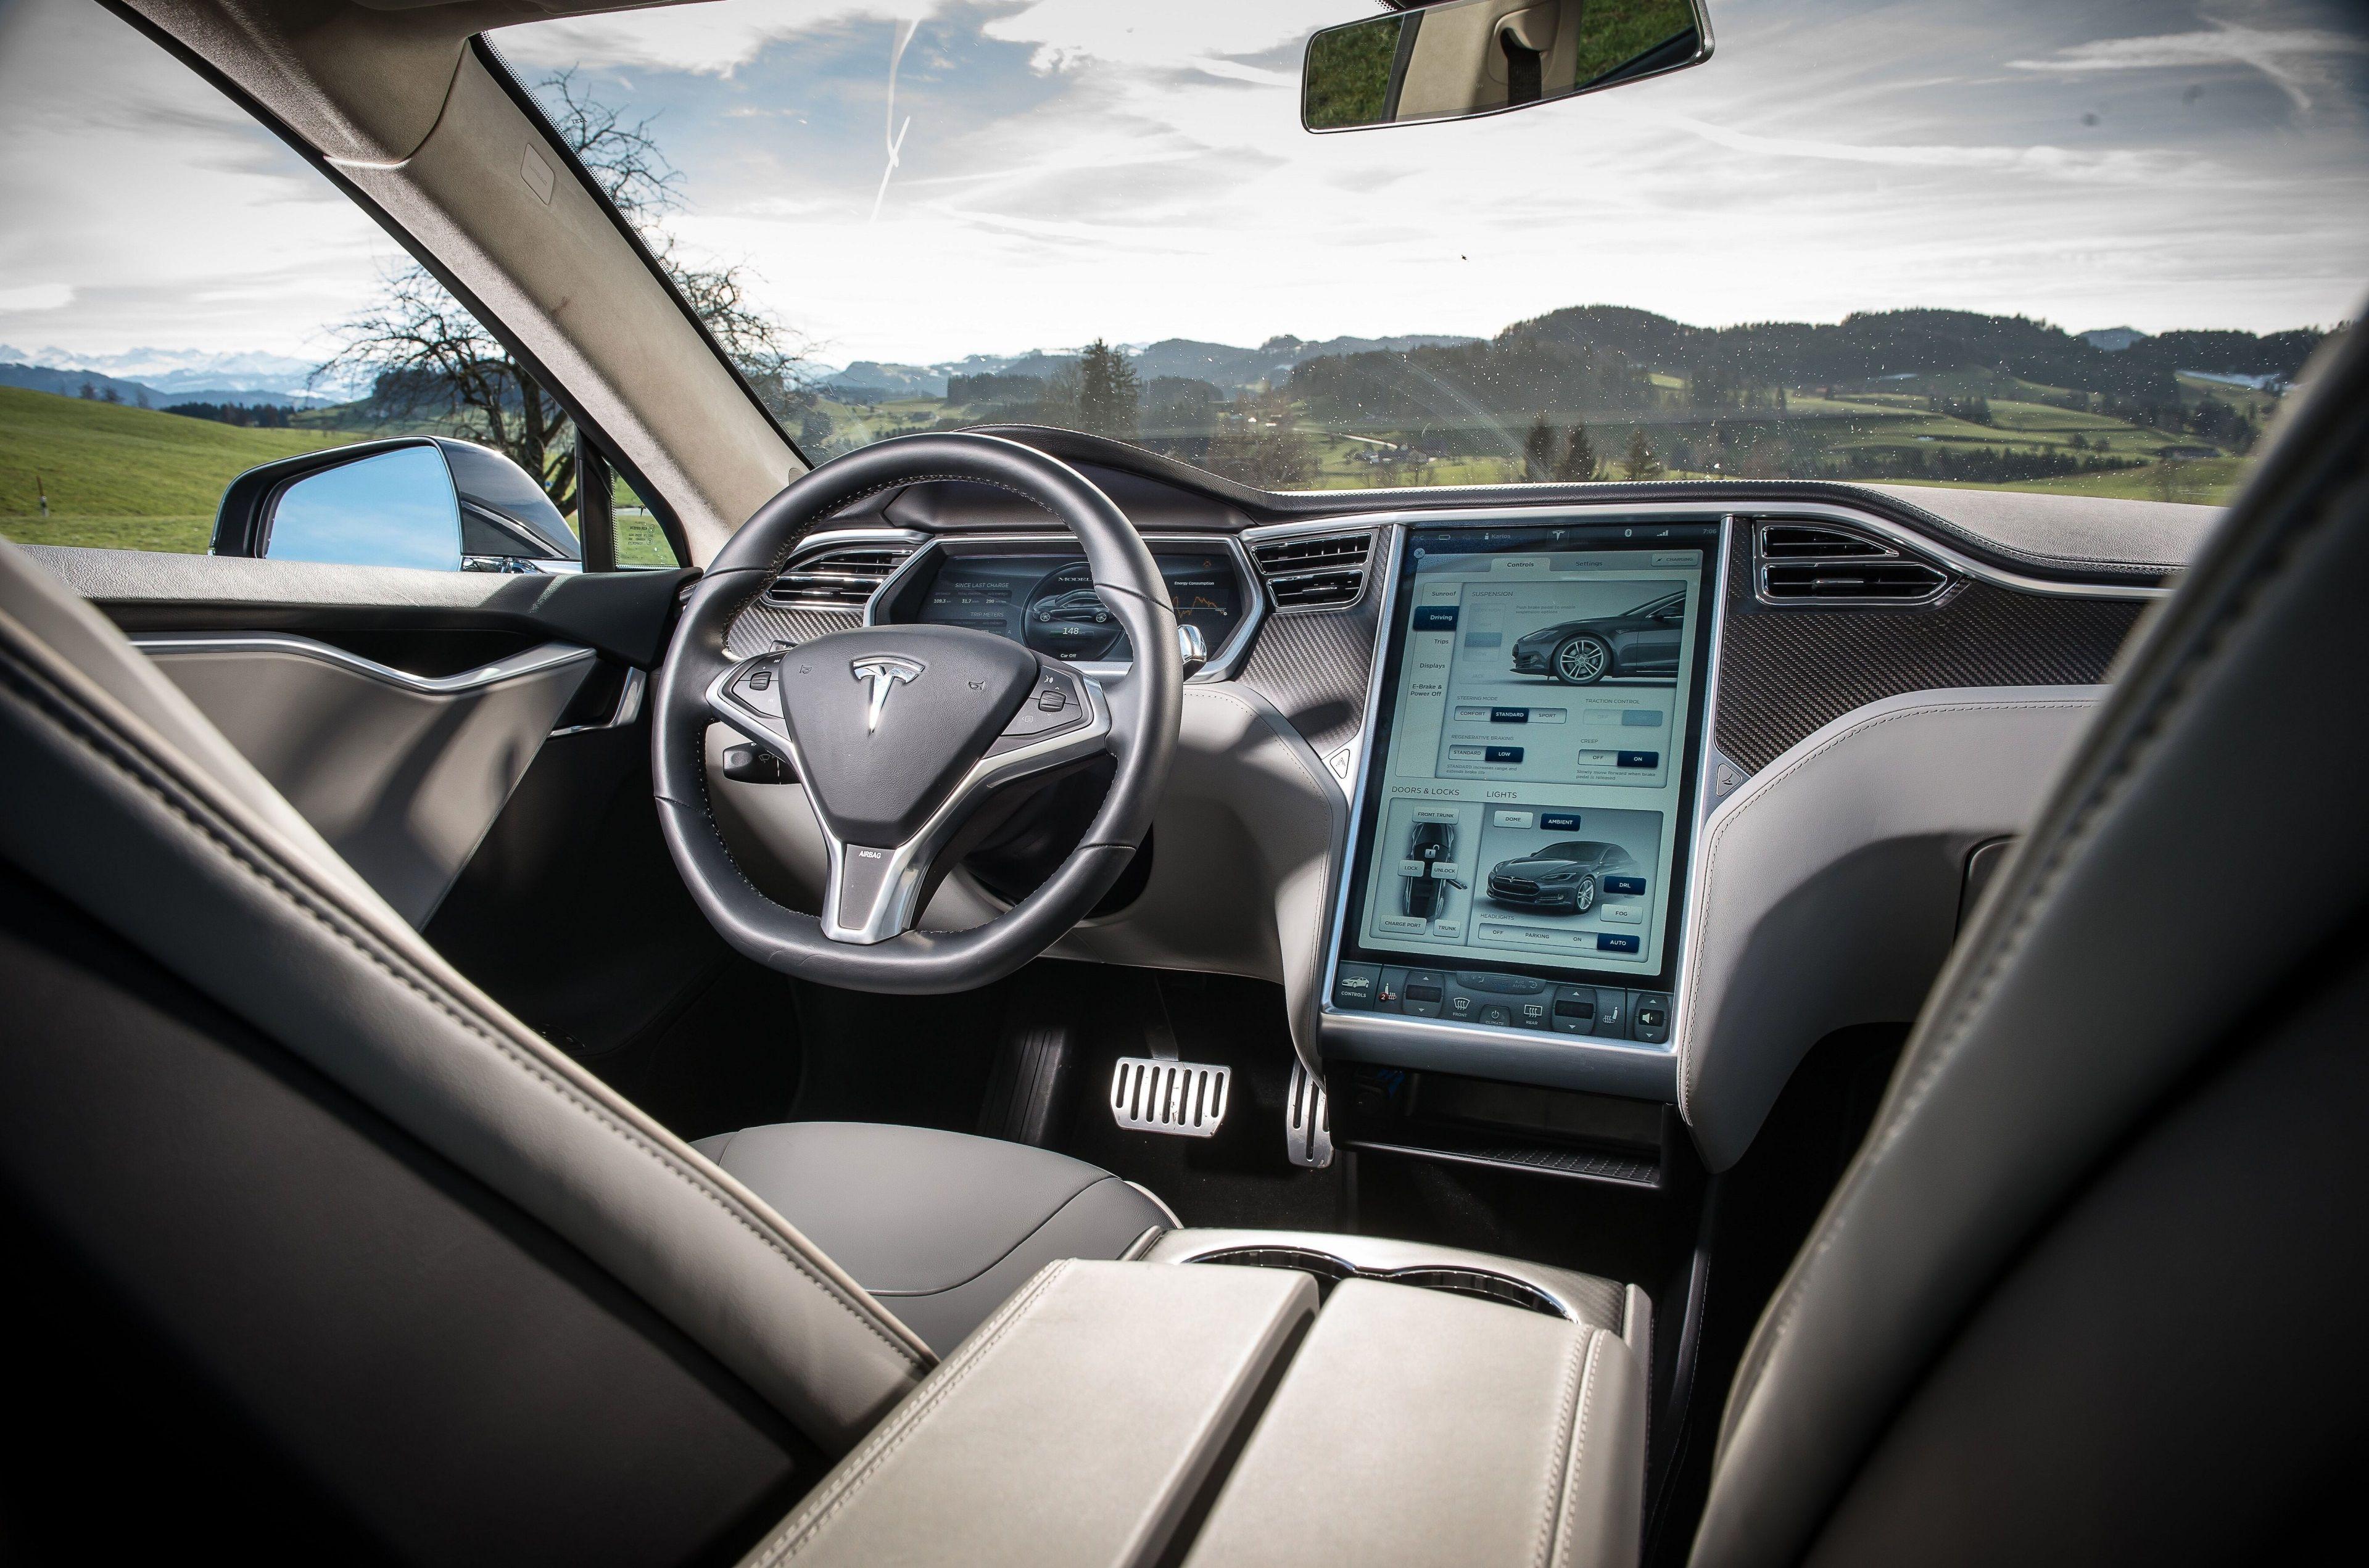 3840x2542 Tesla Model S 4k Hd High Resolution Wallpaper Tesla Model Tesla Model S Tesla